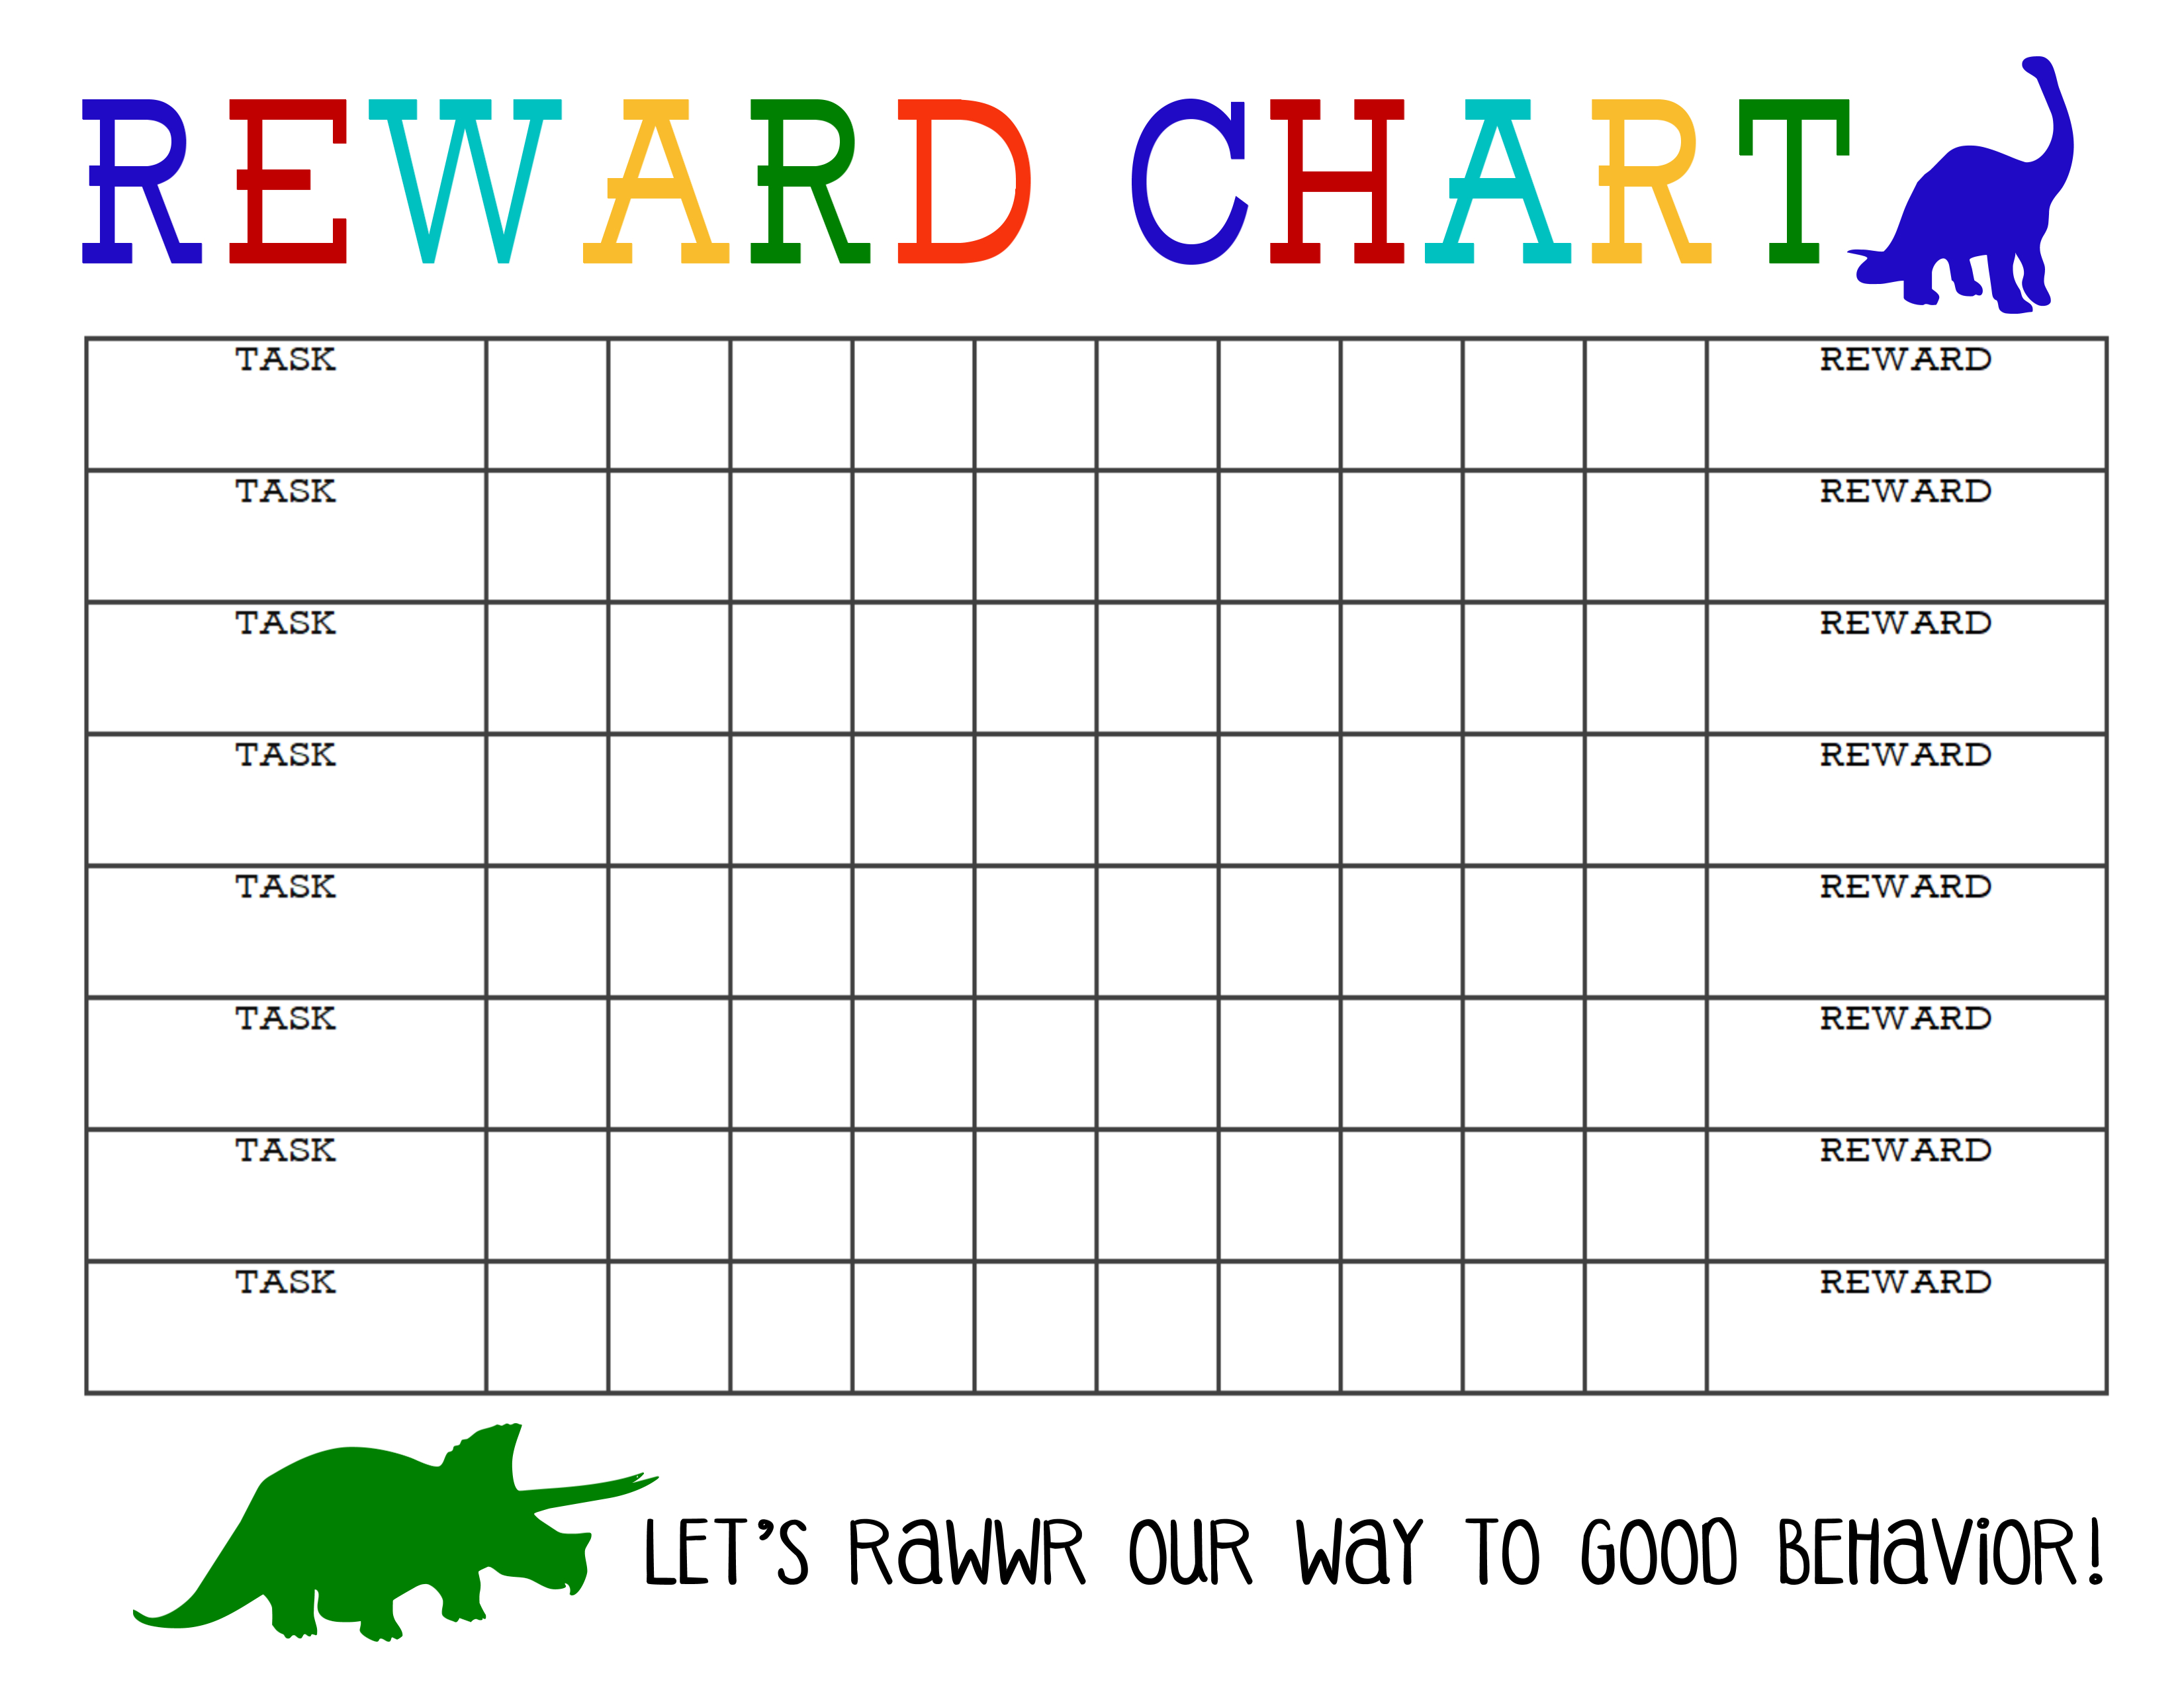 Printable Reward Chart | Chore Chart | Pinterest | Reward Chart Kids - Free Printable Incentive Charts For Students